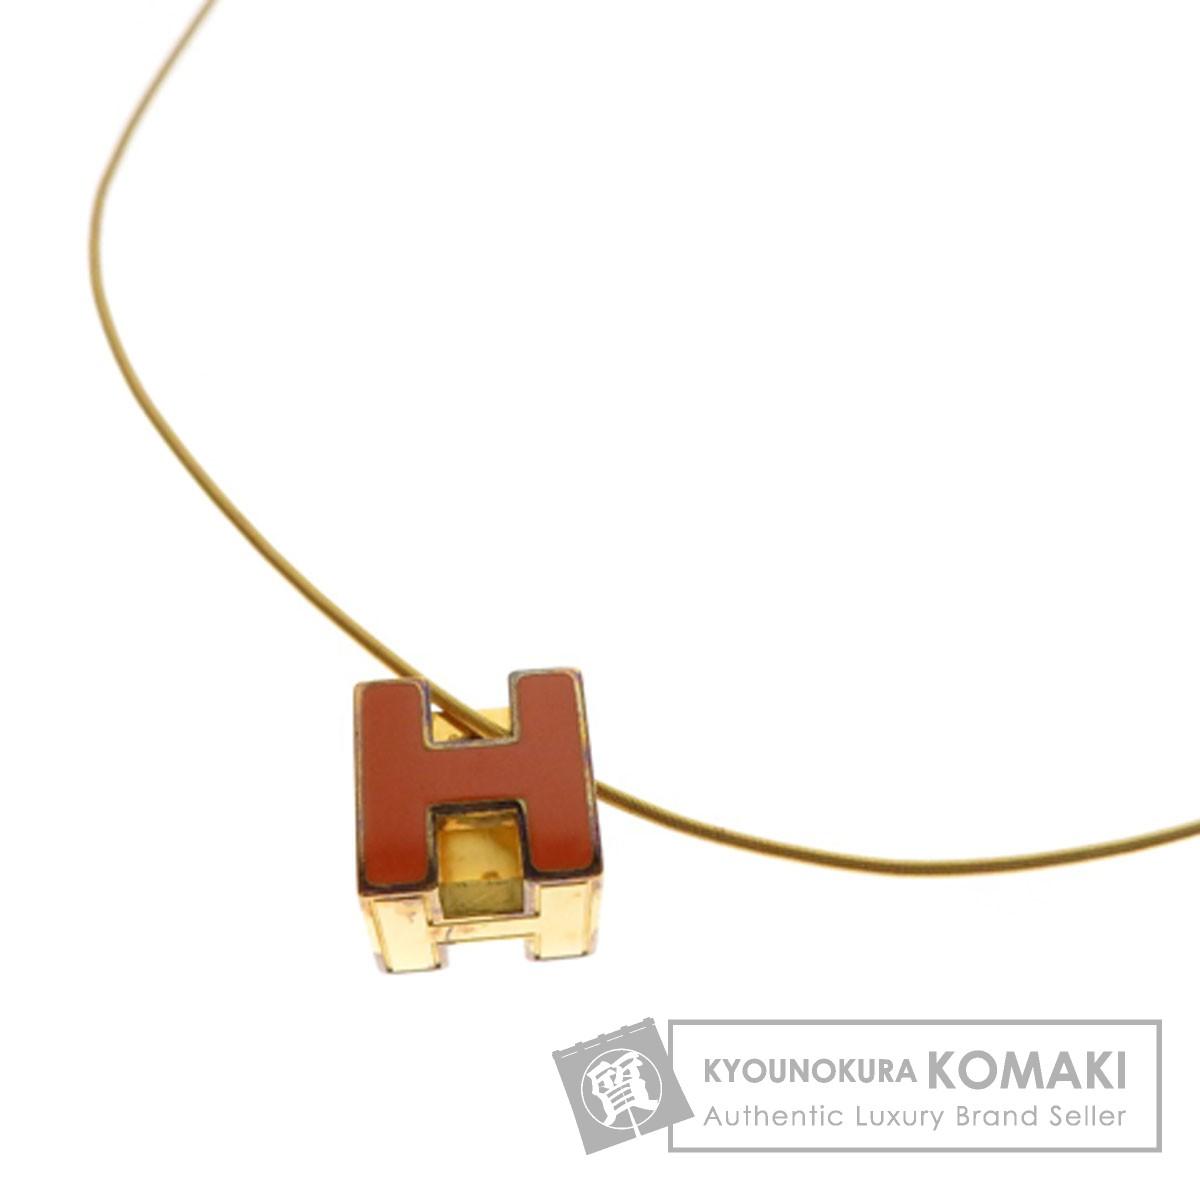 HERMES Hキューブ ネックレス 金属製 レディース 【中古】【エルメス】